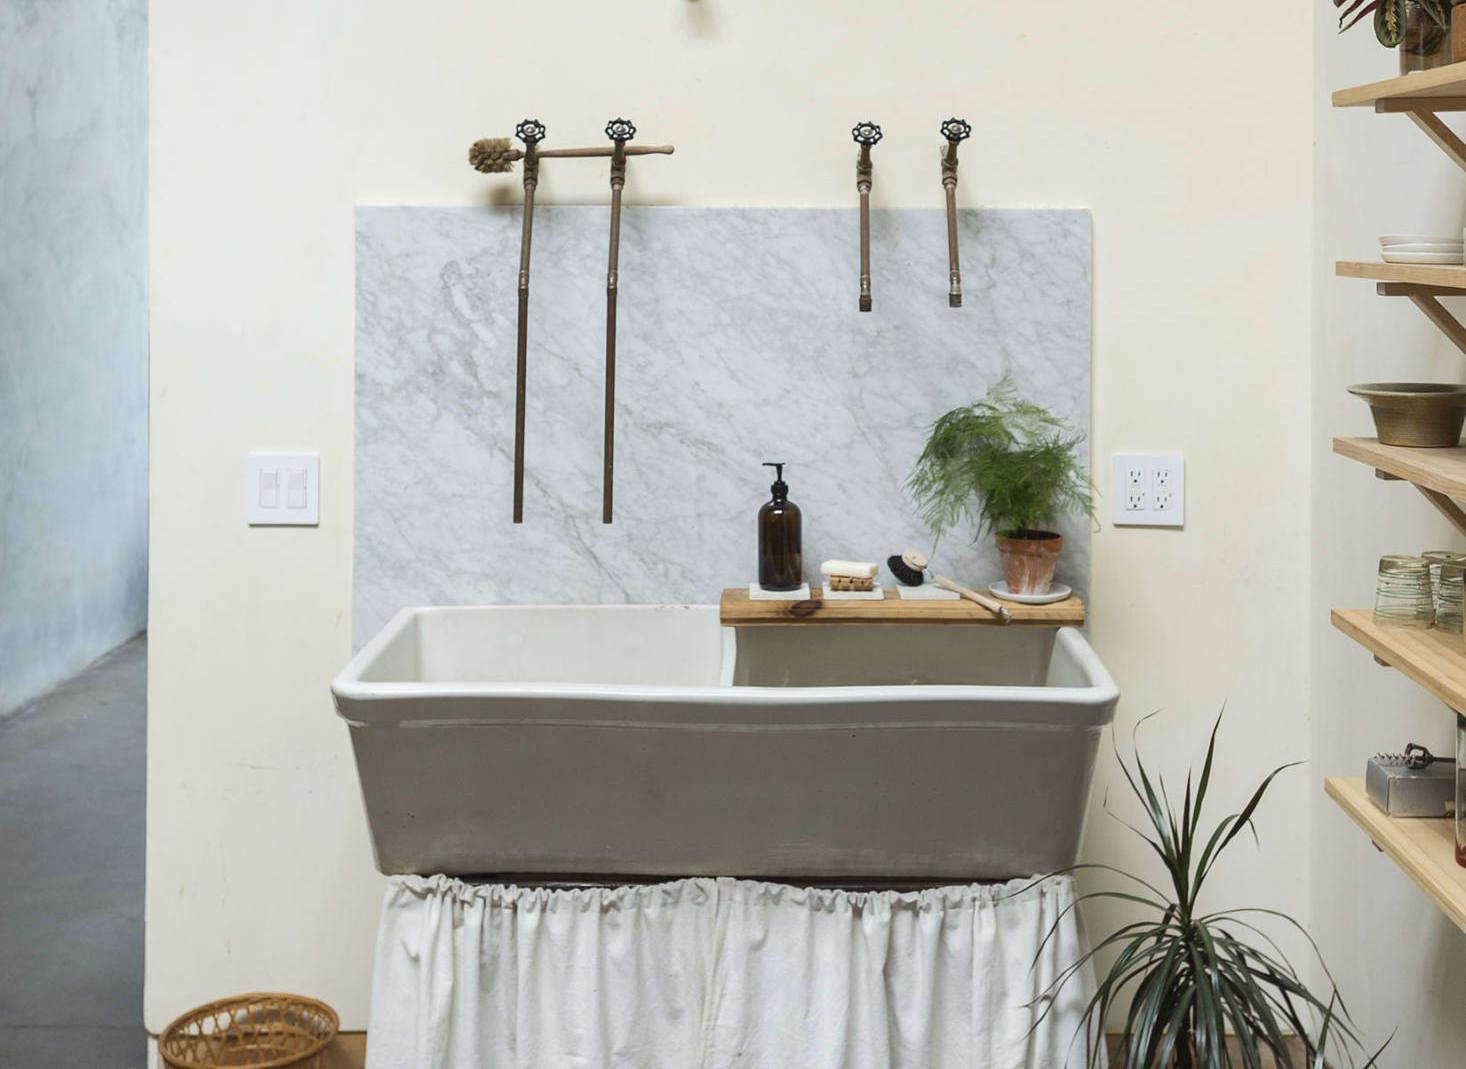 Sink Skirt Revival 16 Fresh Examples, Bathroom Sink Skirts